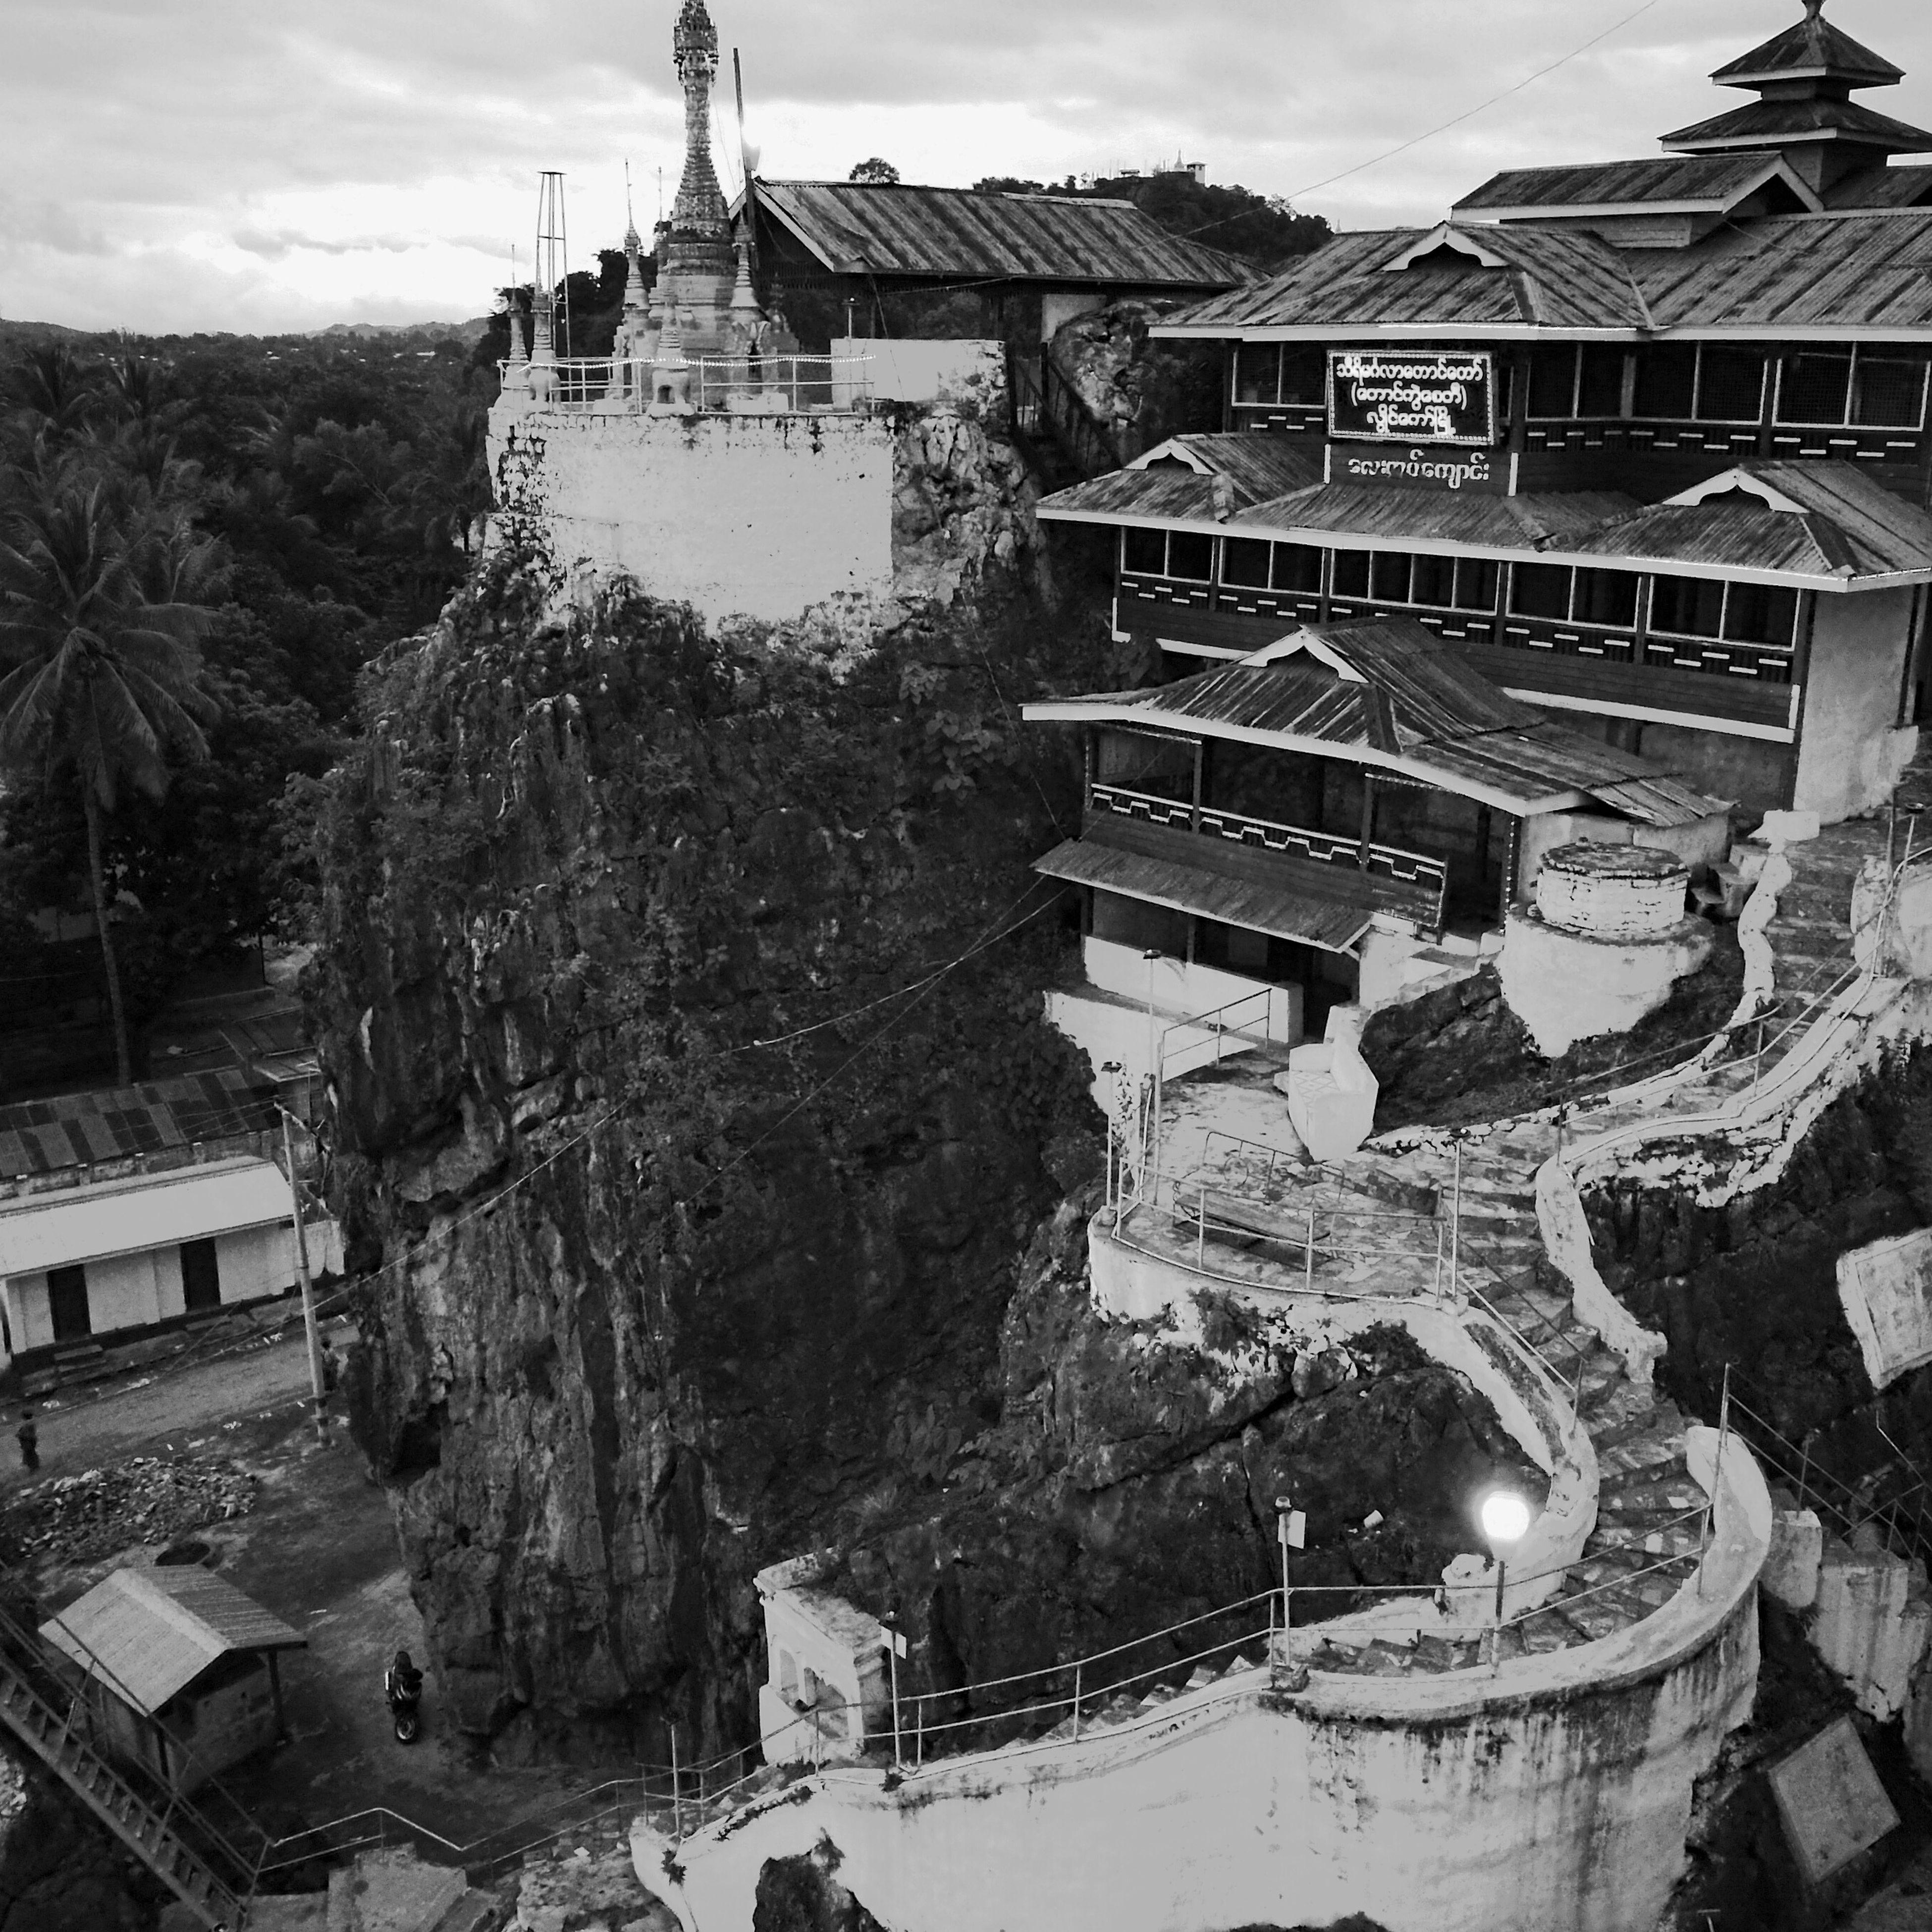 Loikaw Taungkwe Pagoda Pagoda Temple Pagoda On Moutain Pagoda In Myanmar Black & White P9 Huawei Pro Mode